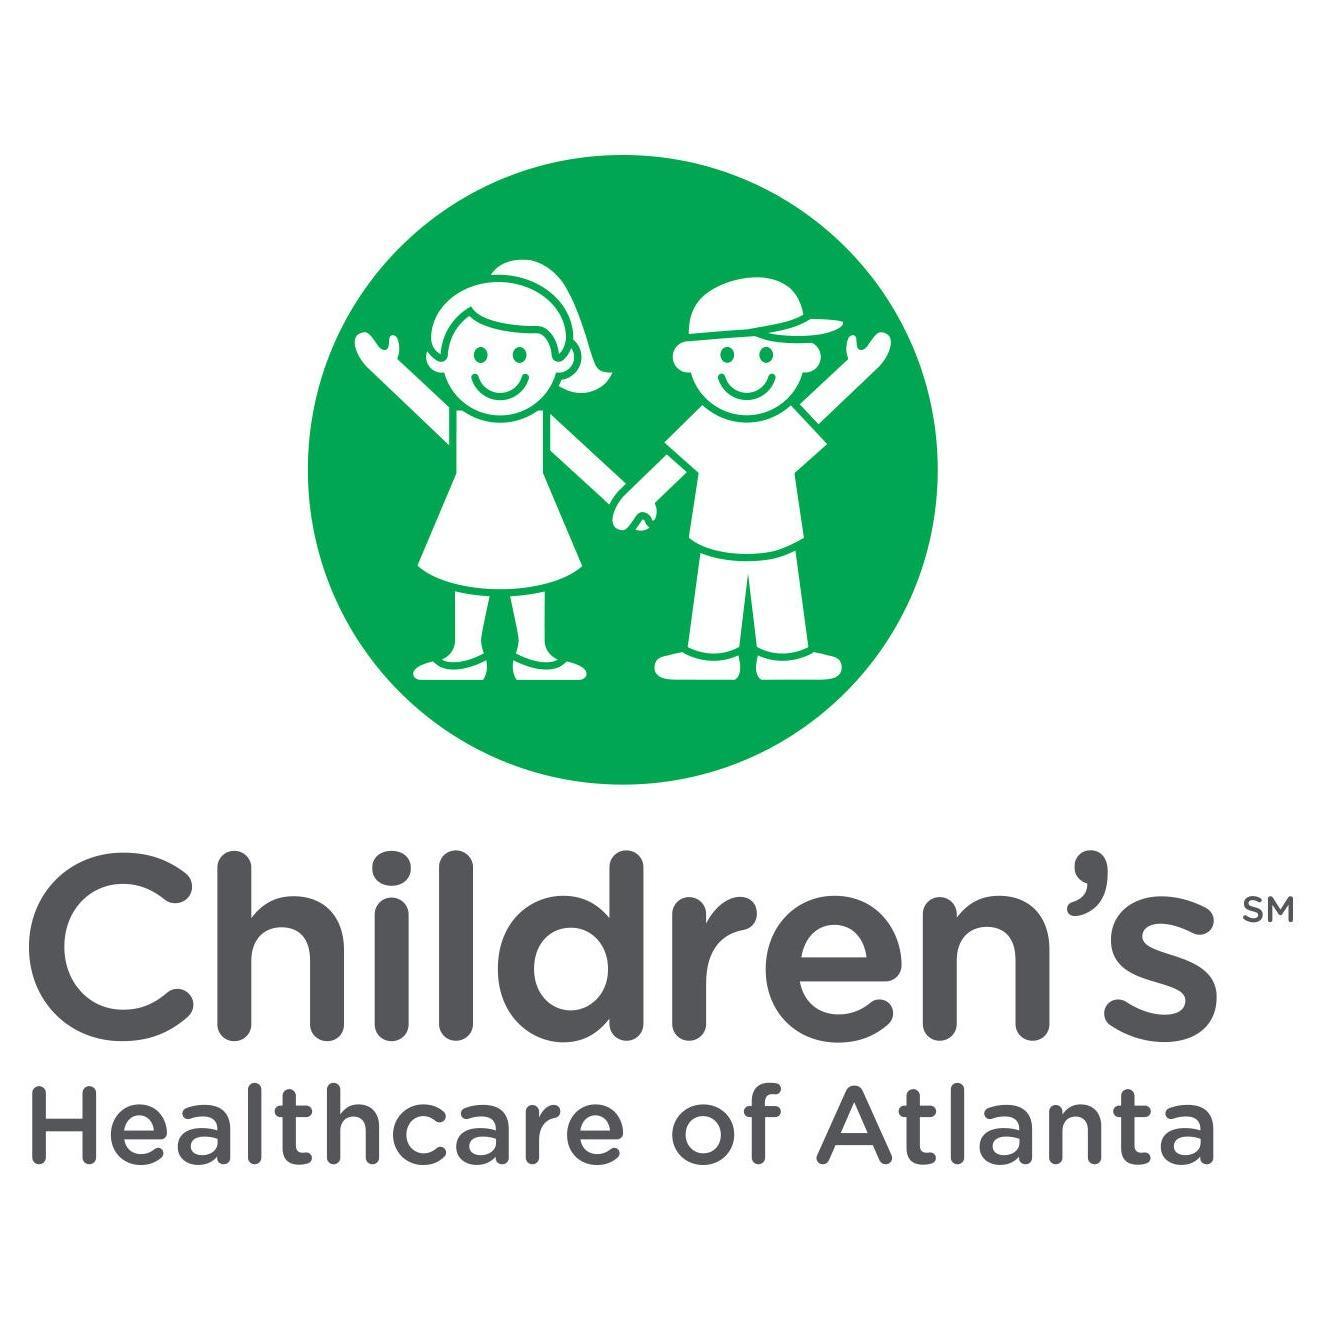 Children's Healthcare of Atlanta Rehabilitation - Satellite Boulevard Outpatient Surgery Center